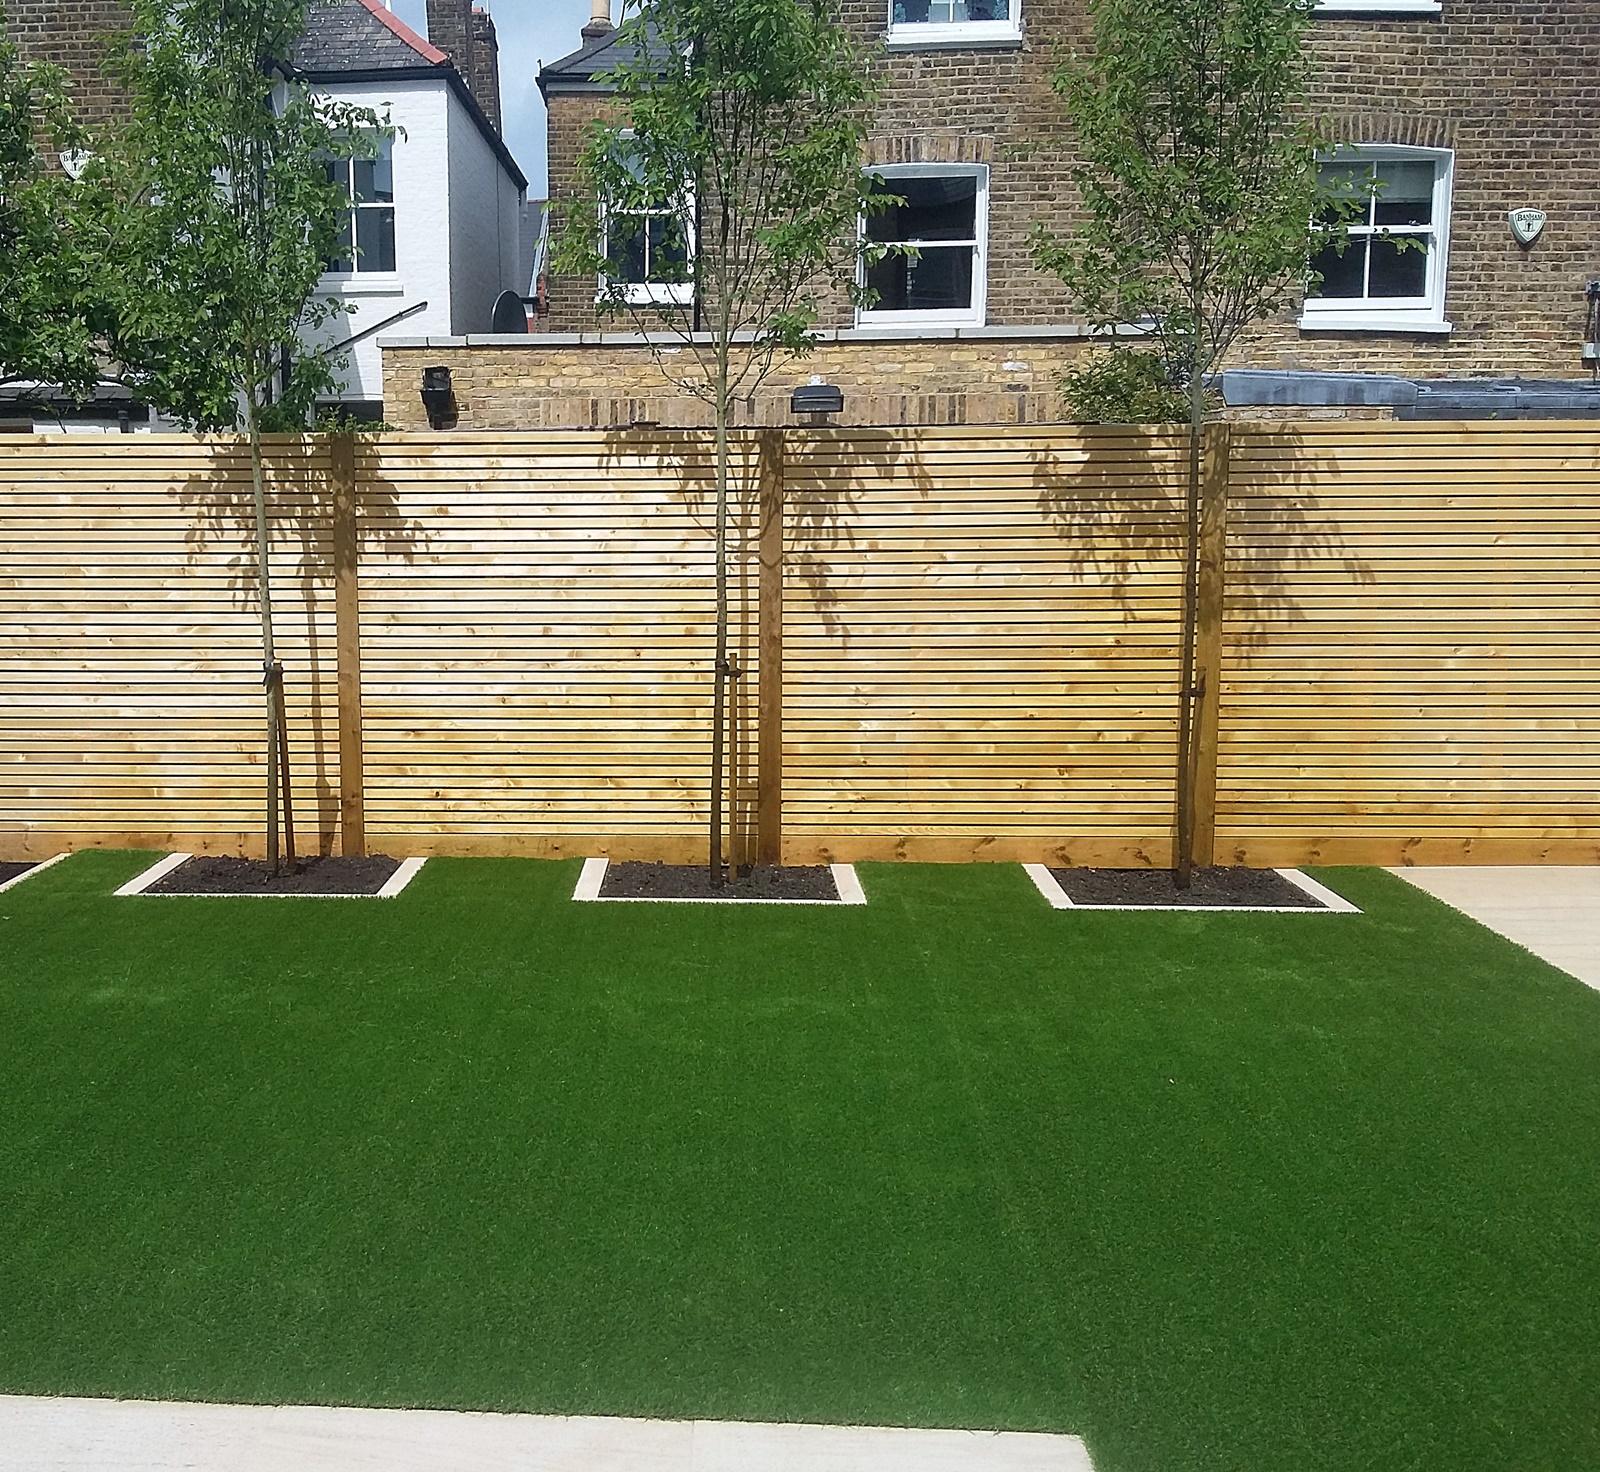 Low maintenance modern garden design screen privacy fence easi grass